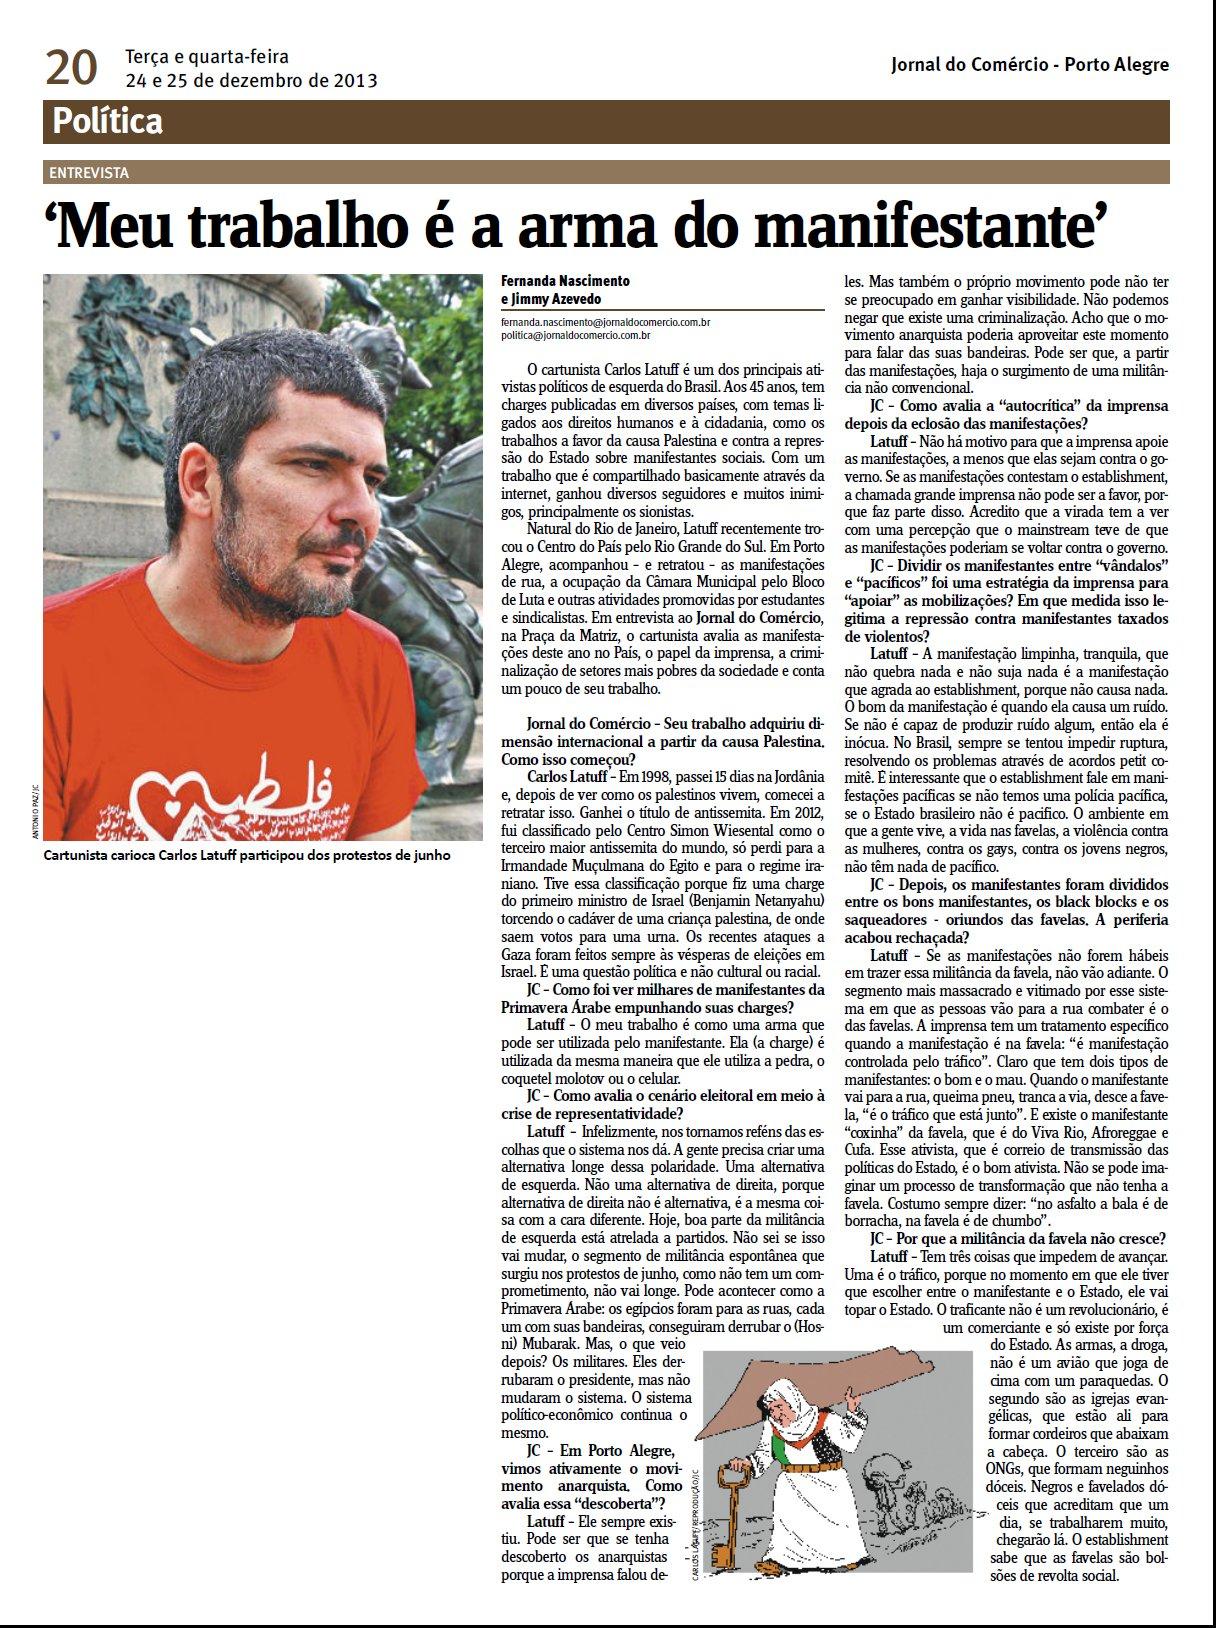 Entrevista Latuff Jornal do Comercio Porto Alegre 24Dez2013